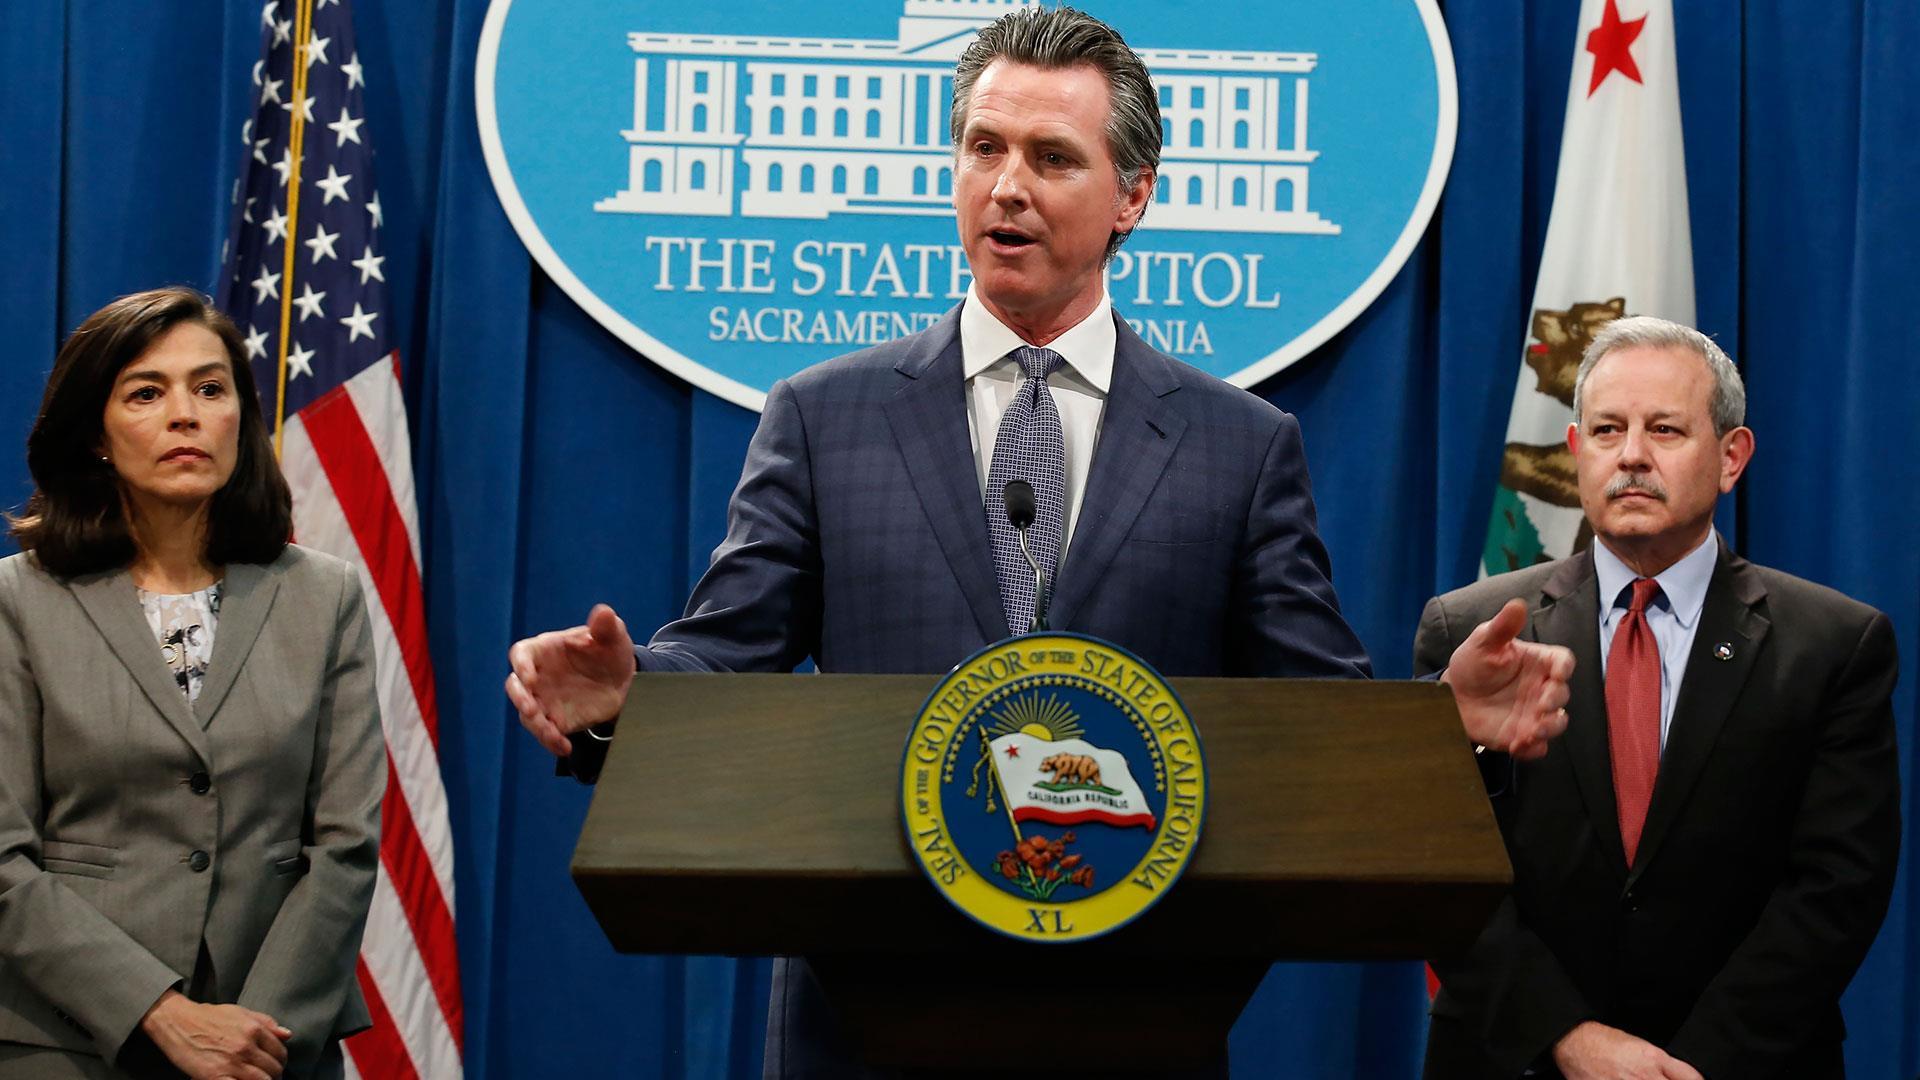 California legislators call for end of state of emergency 3/18/21